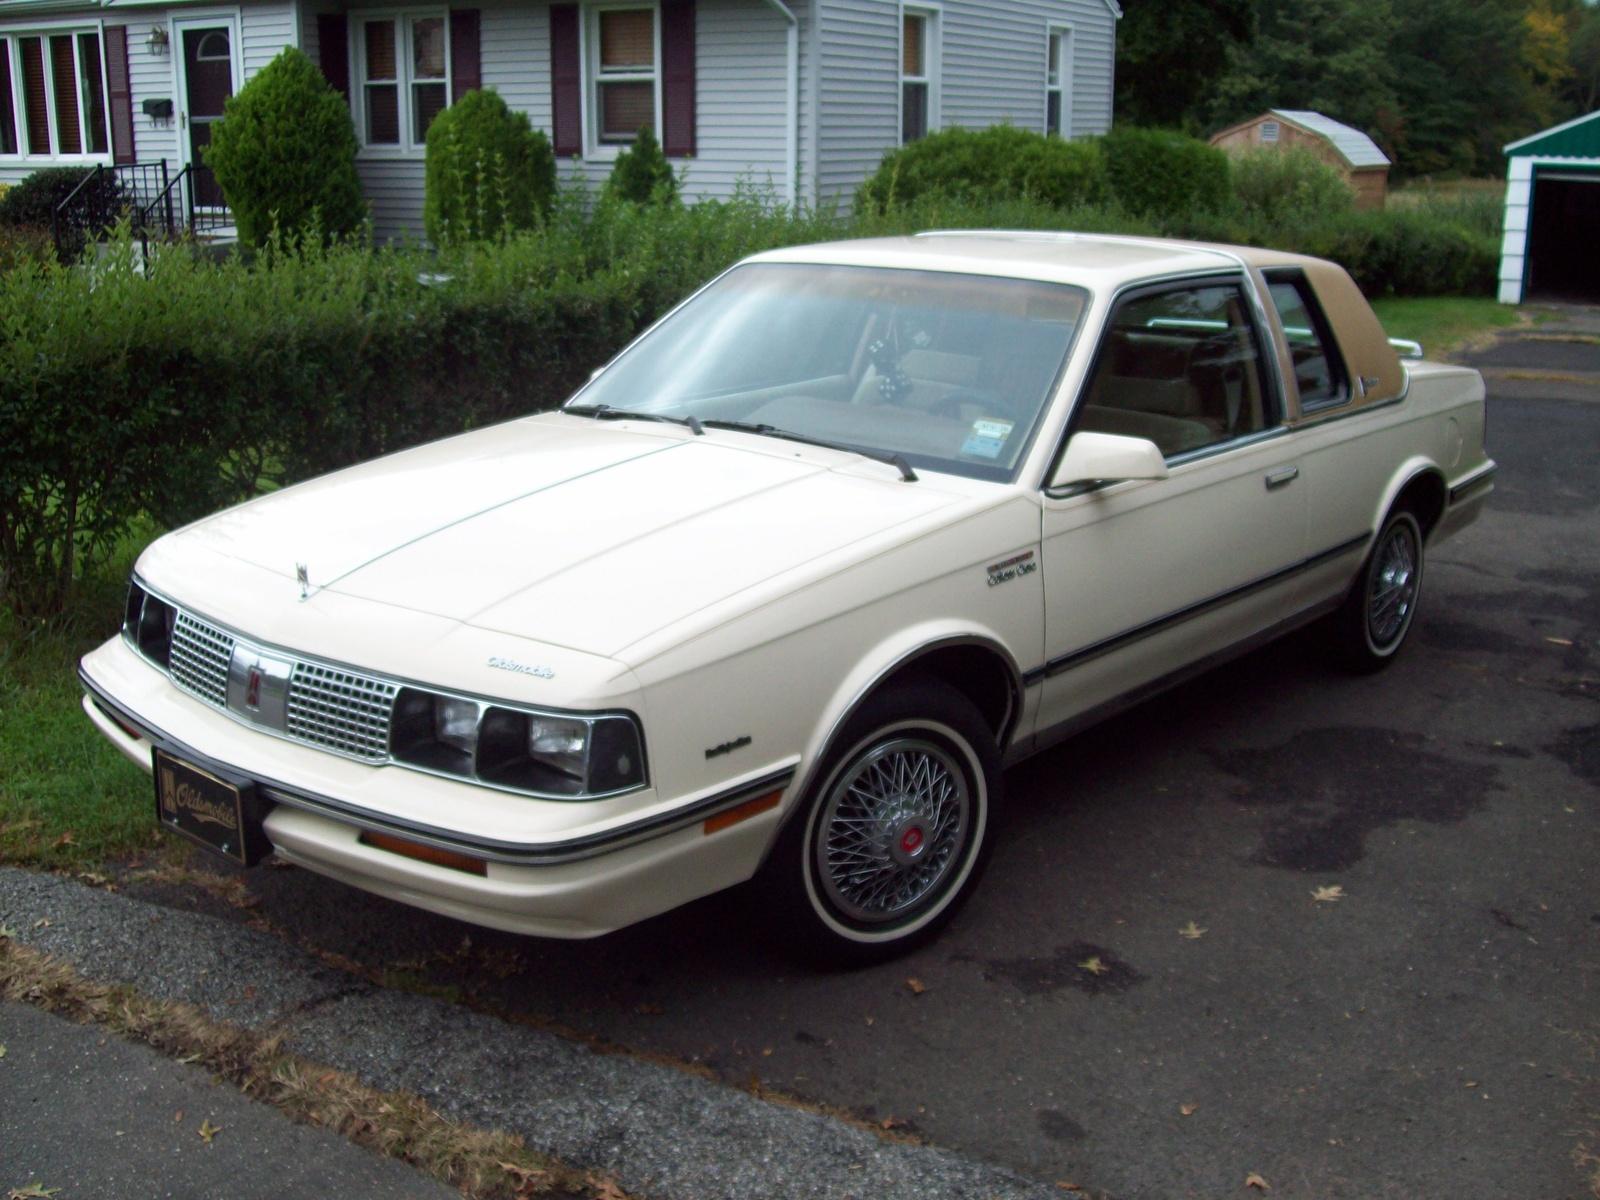 Oldsmobile Cutlass Ciera 1981 - 1996 Coupe #5